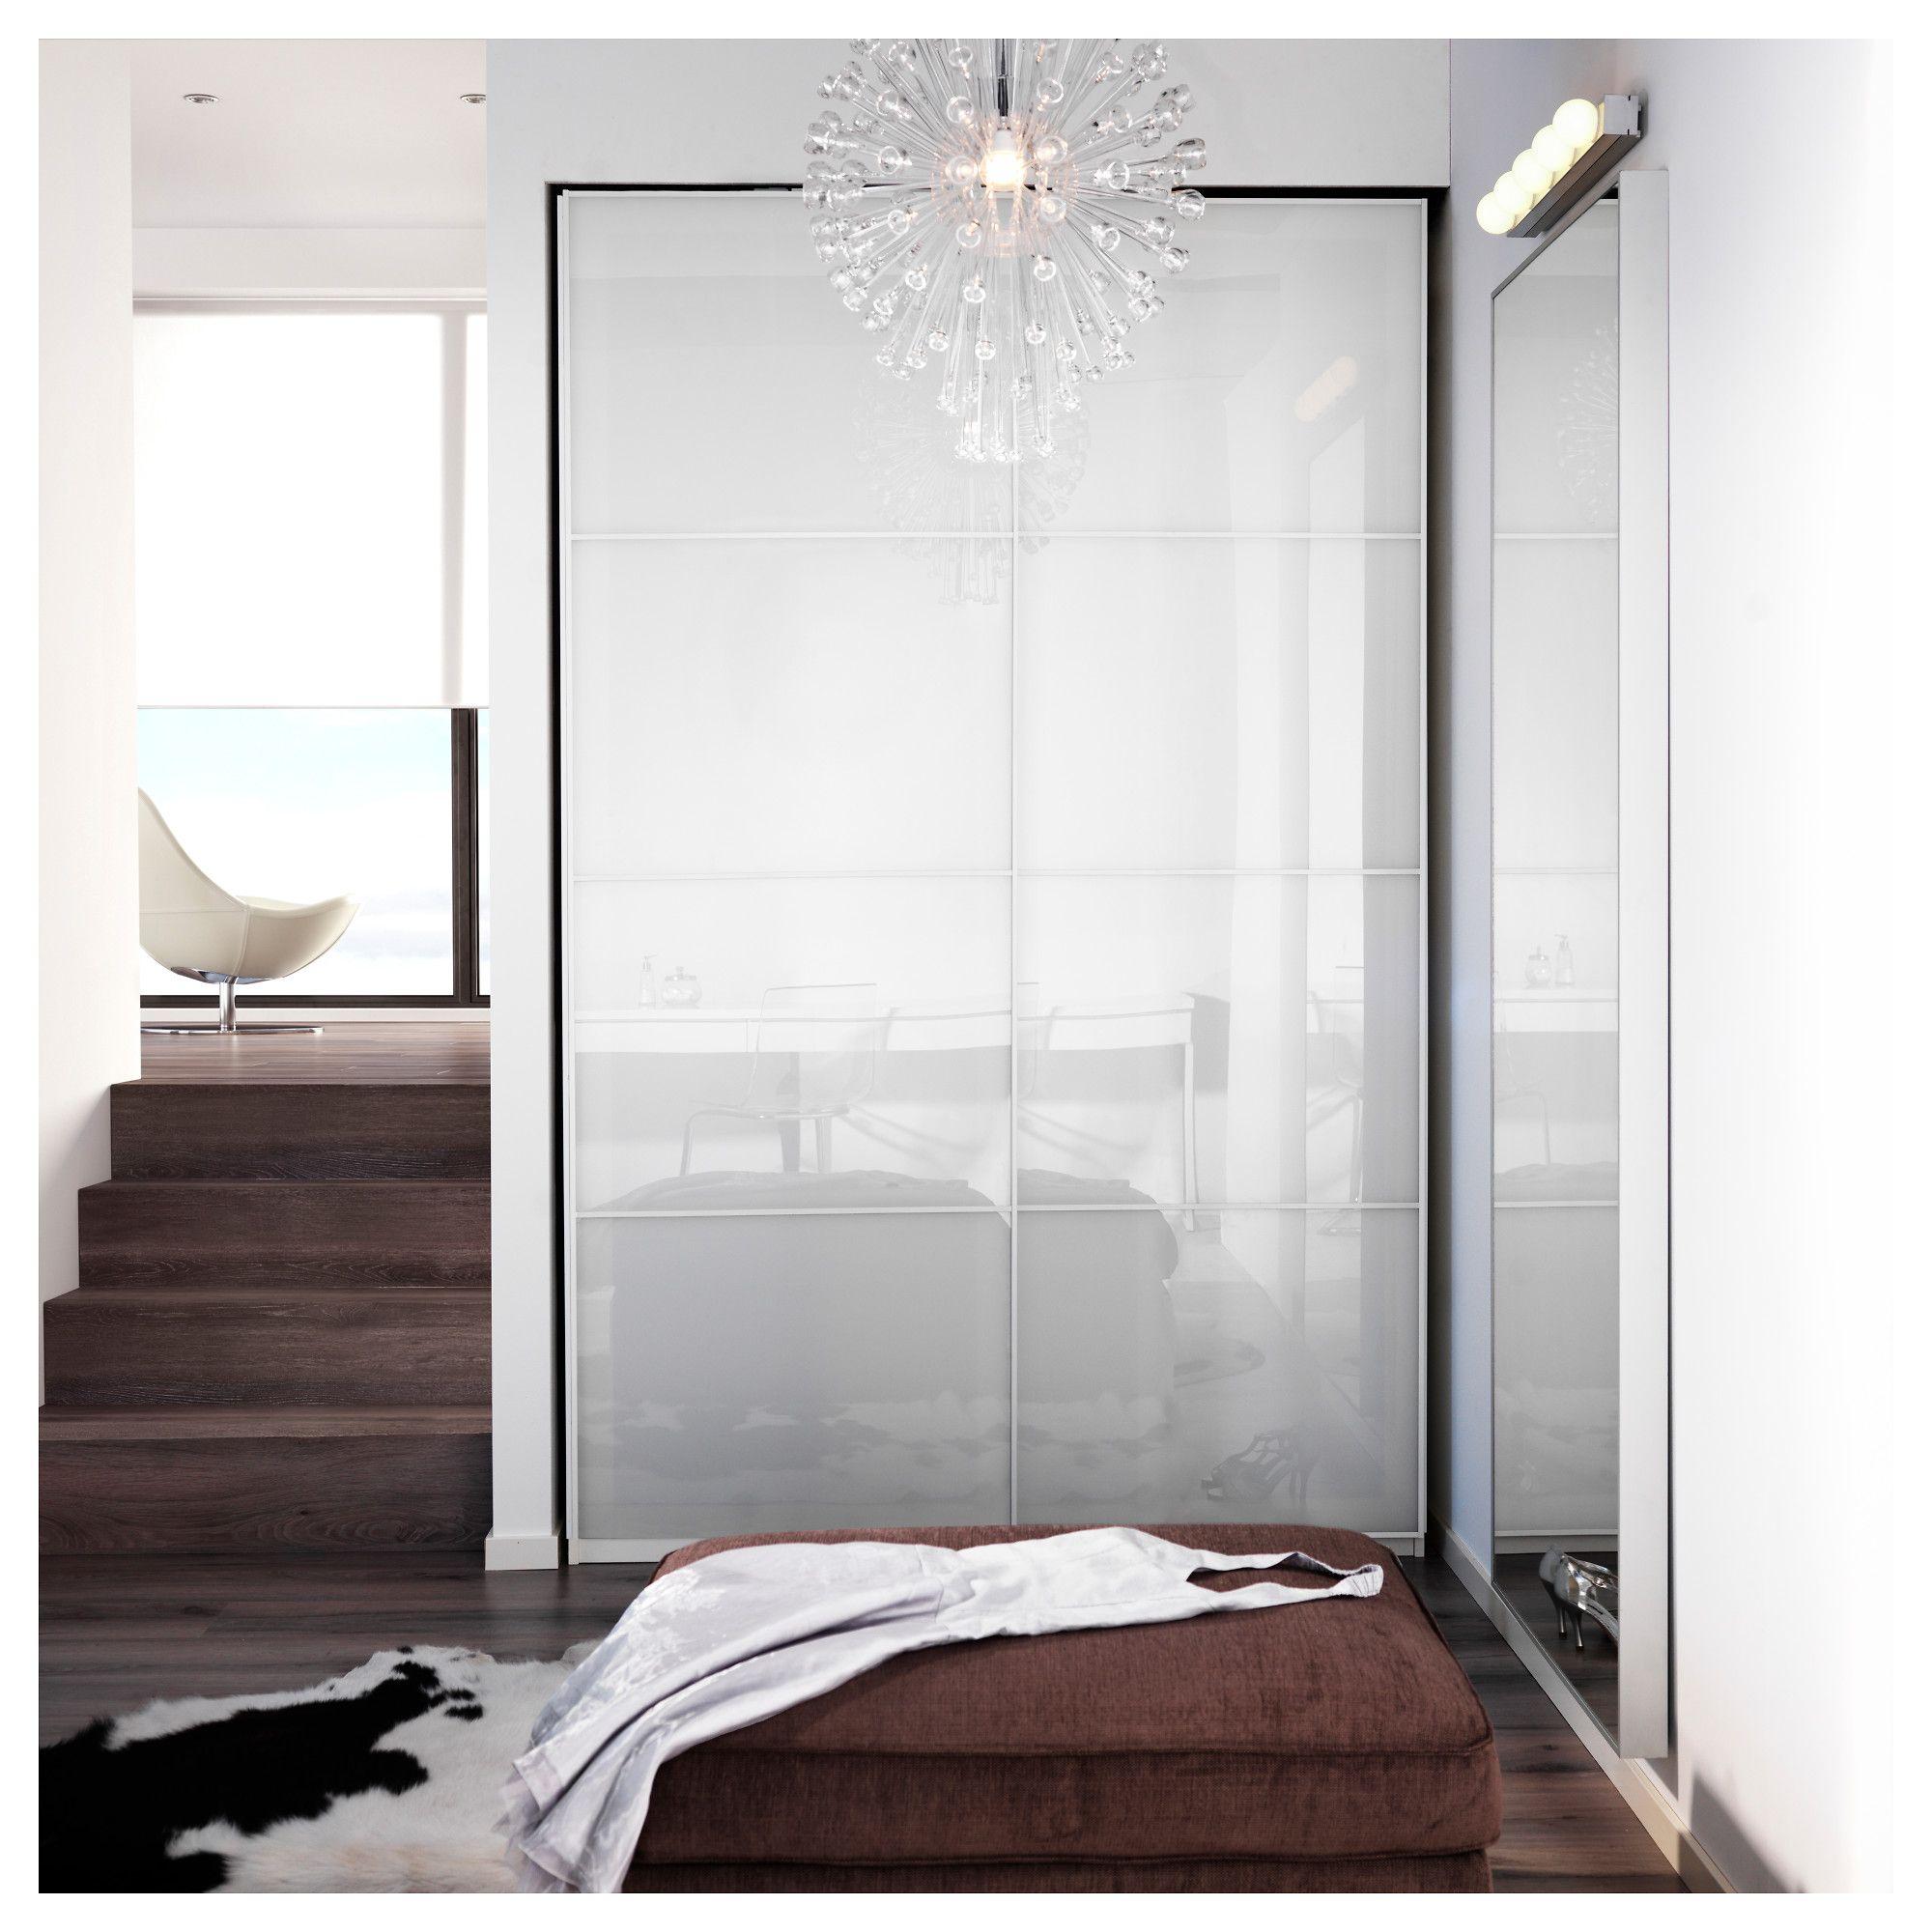 Ikea Farvik White Glass Pair Of Sliding Doors Sliding Wardrobe Doors Sliding Doors Pax Wardrobe